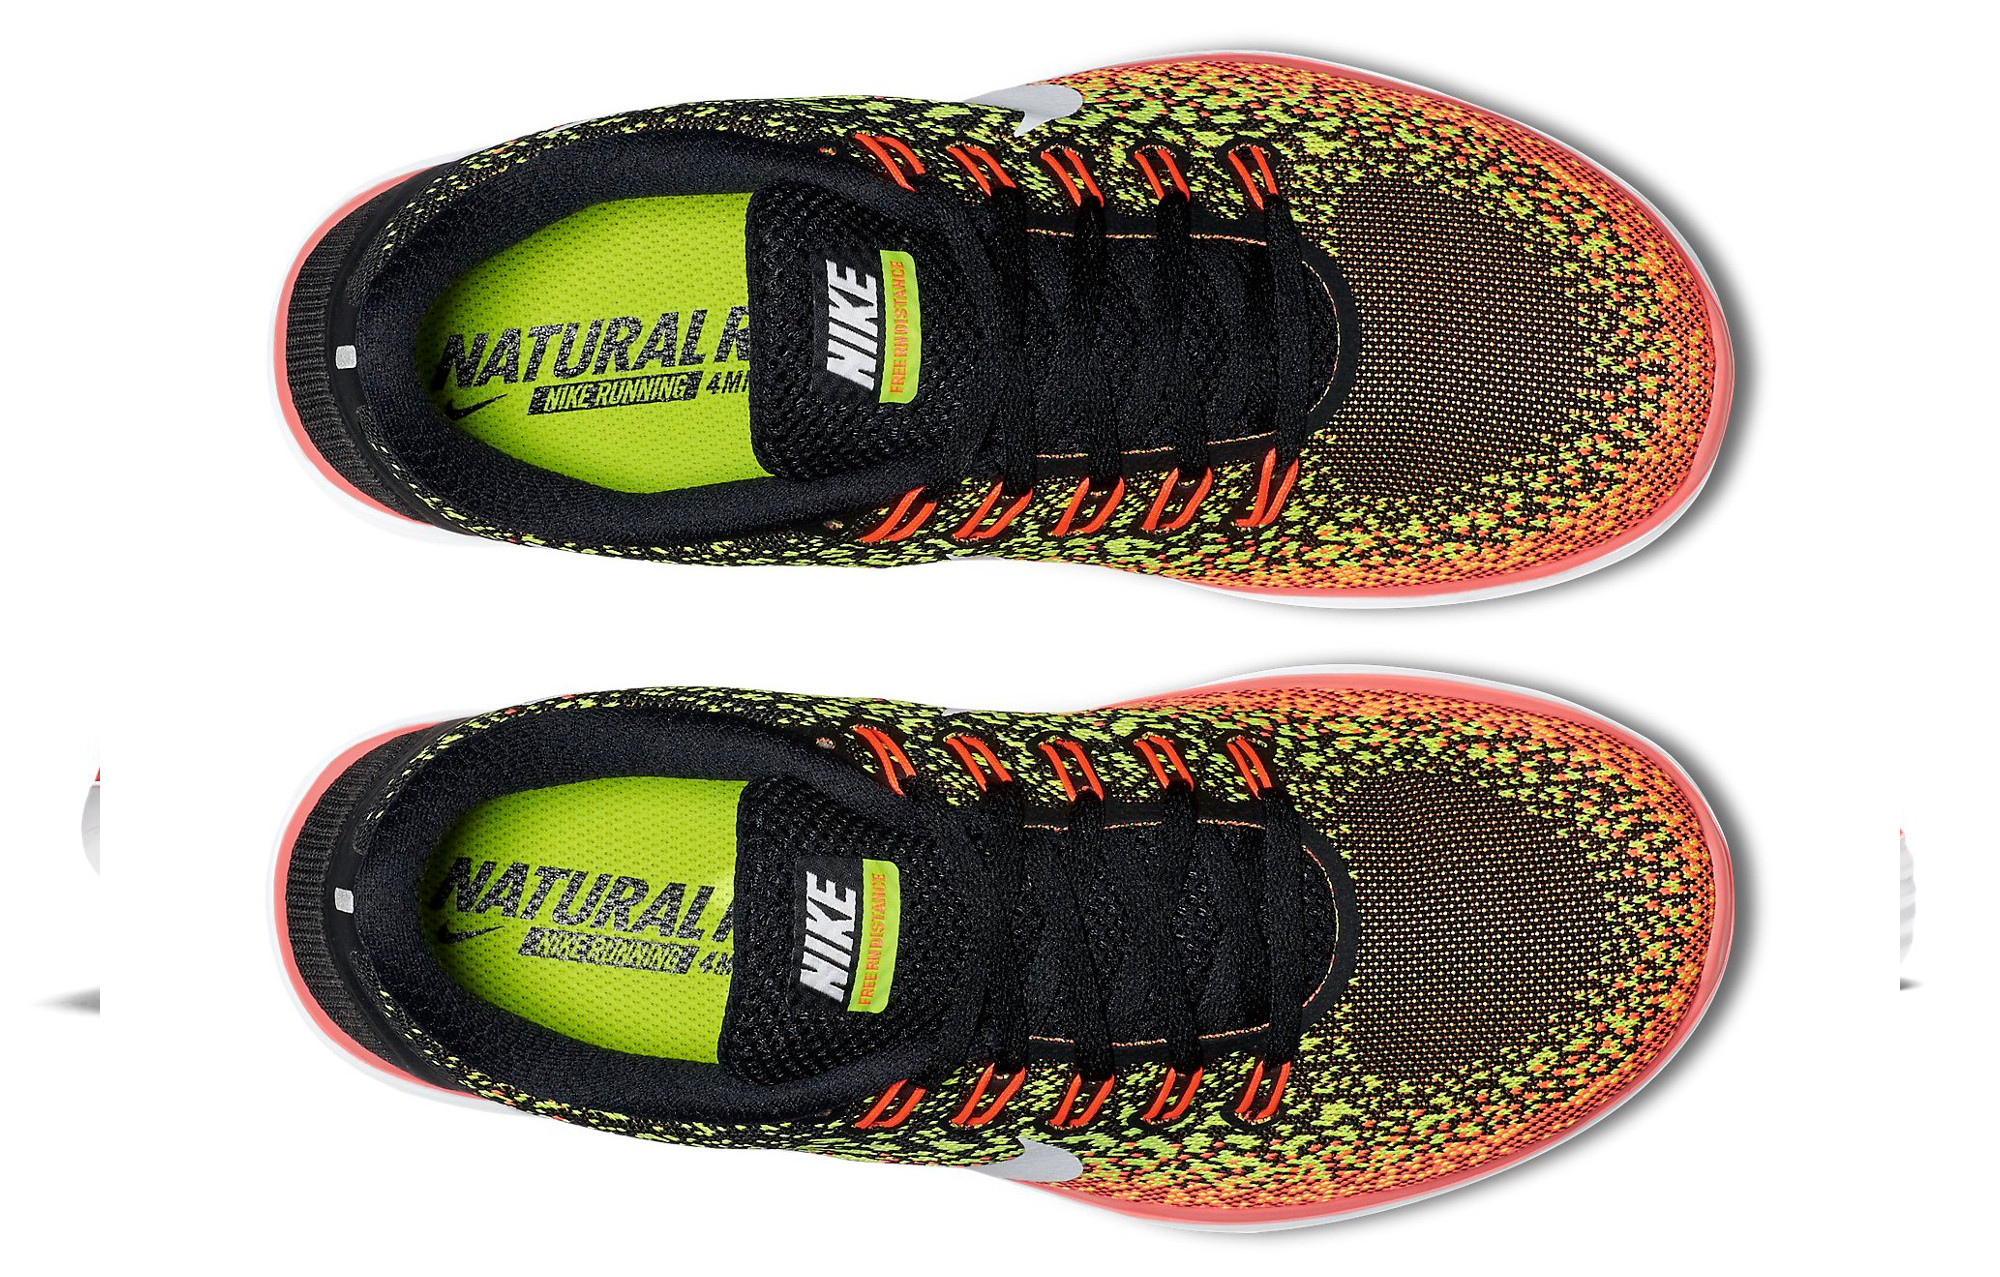 purchase cheap 671bc ba241 Chaussures de Running Femme Nike FREE RUN DISTANCE Noir   Jaune   Orange